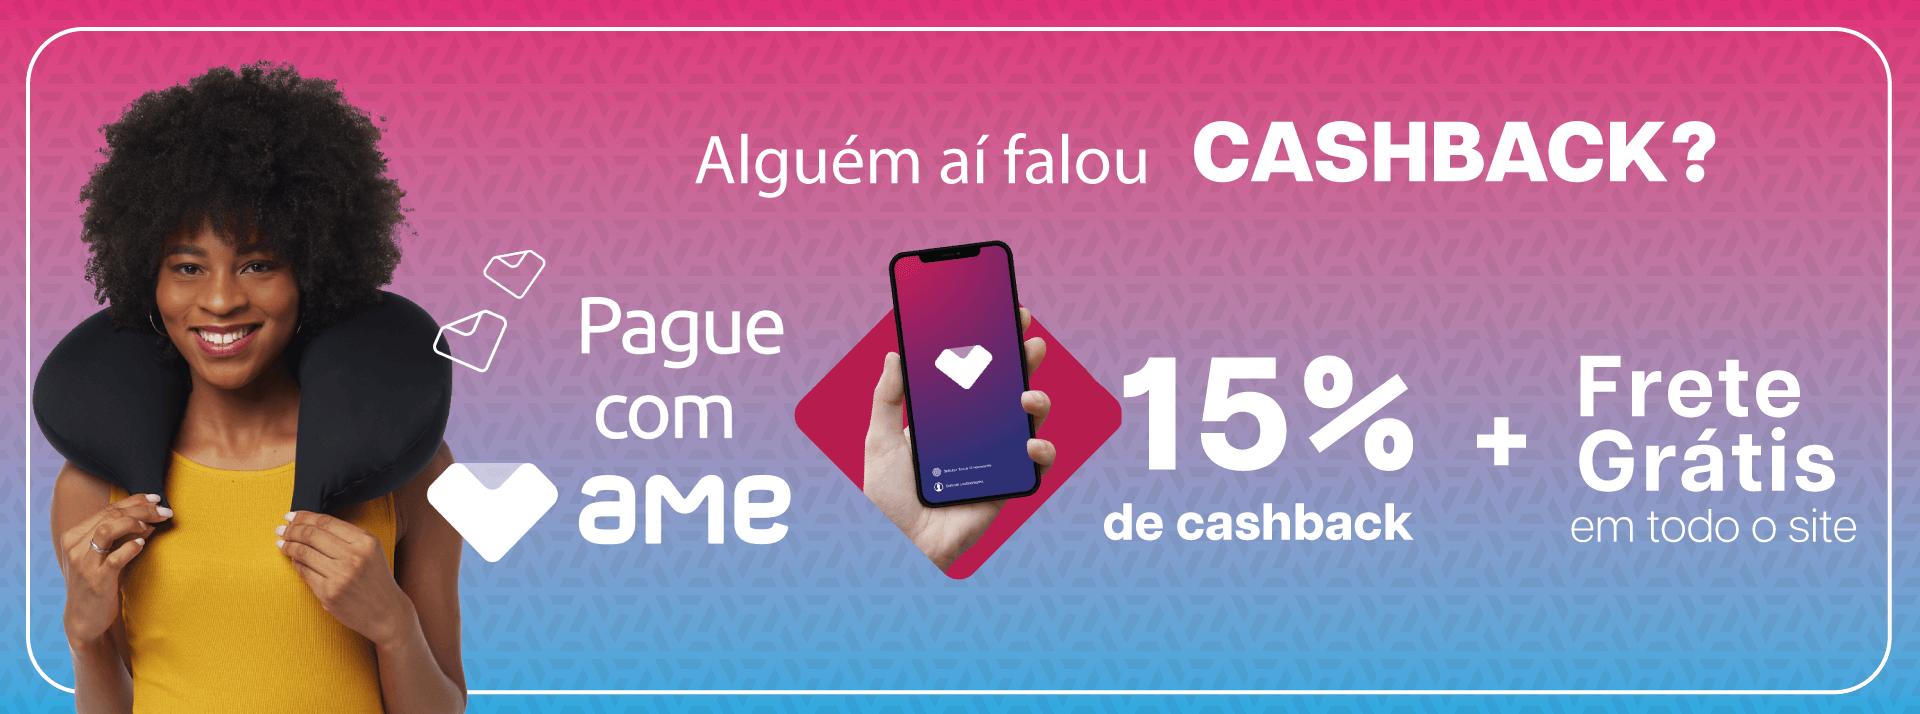 AME 15% Cashback